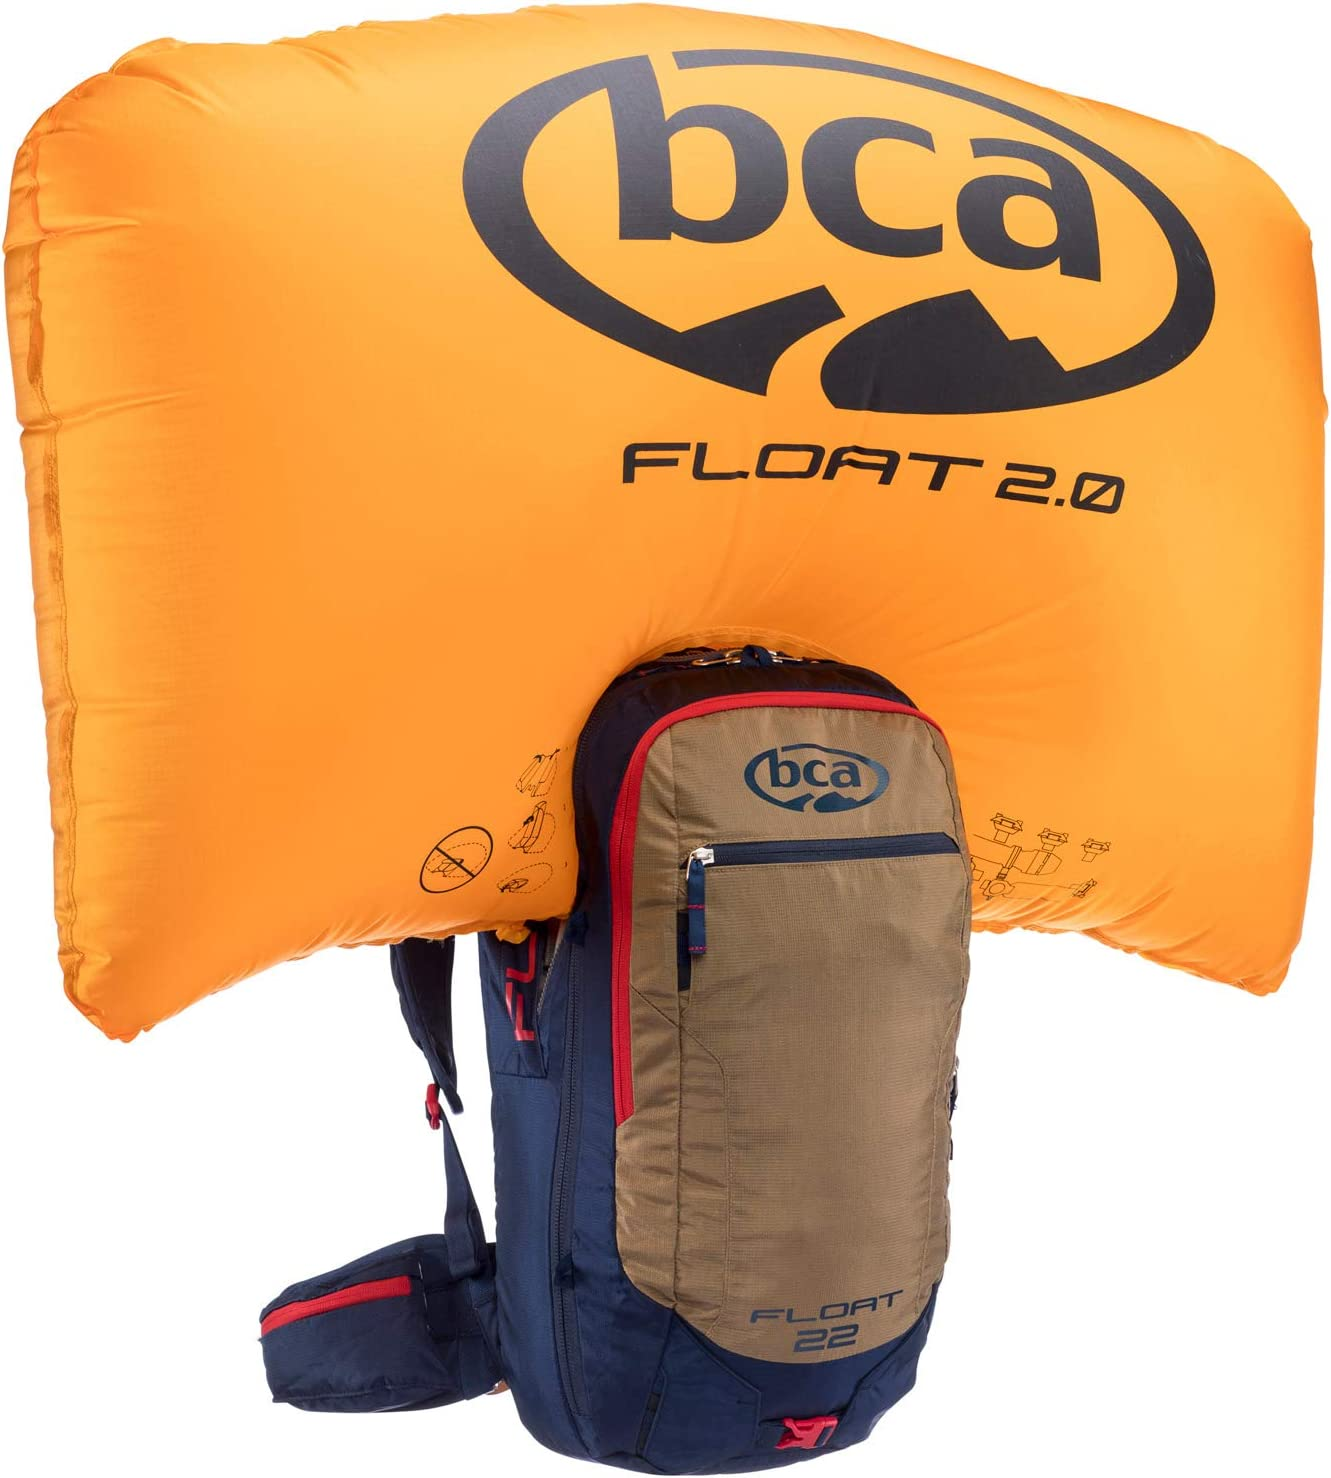 bca Float 2.0 Lawinenrucksack